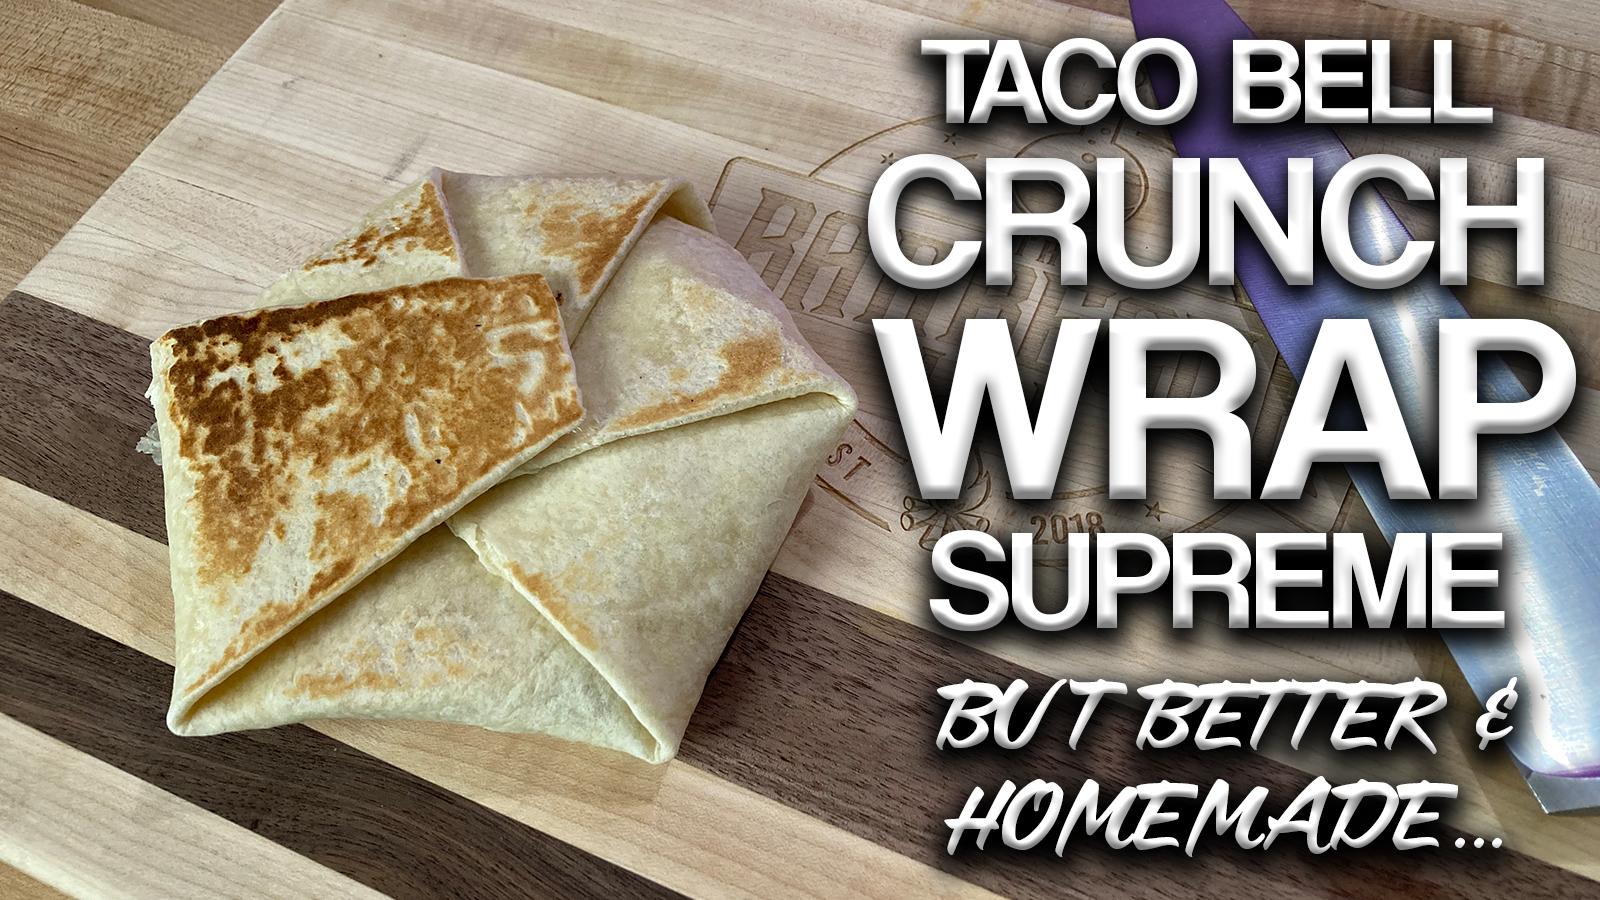 crunch wrap supreme title image